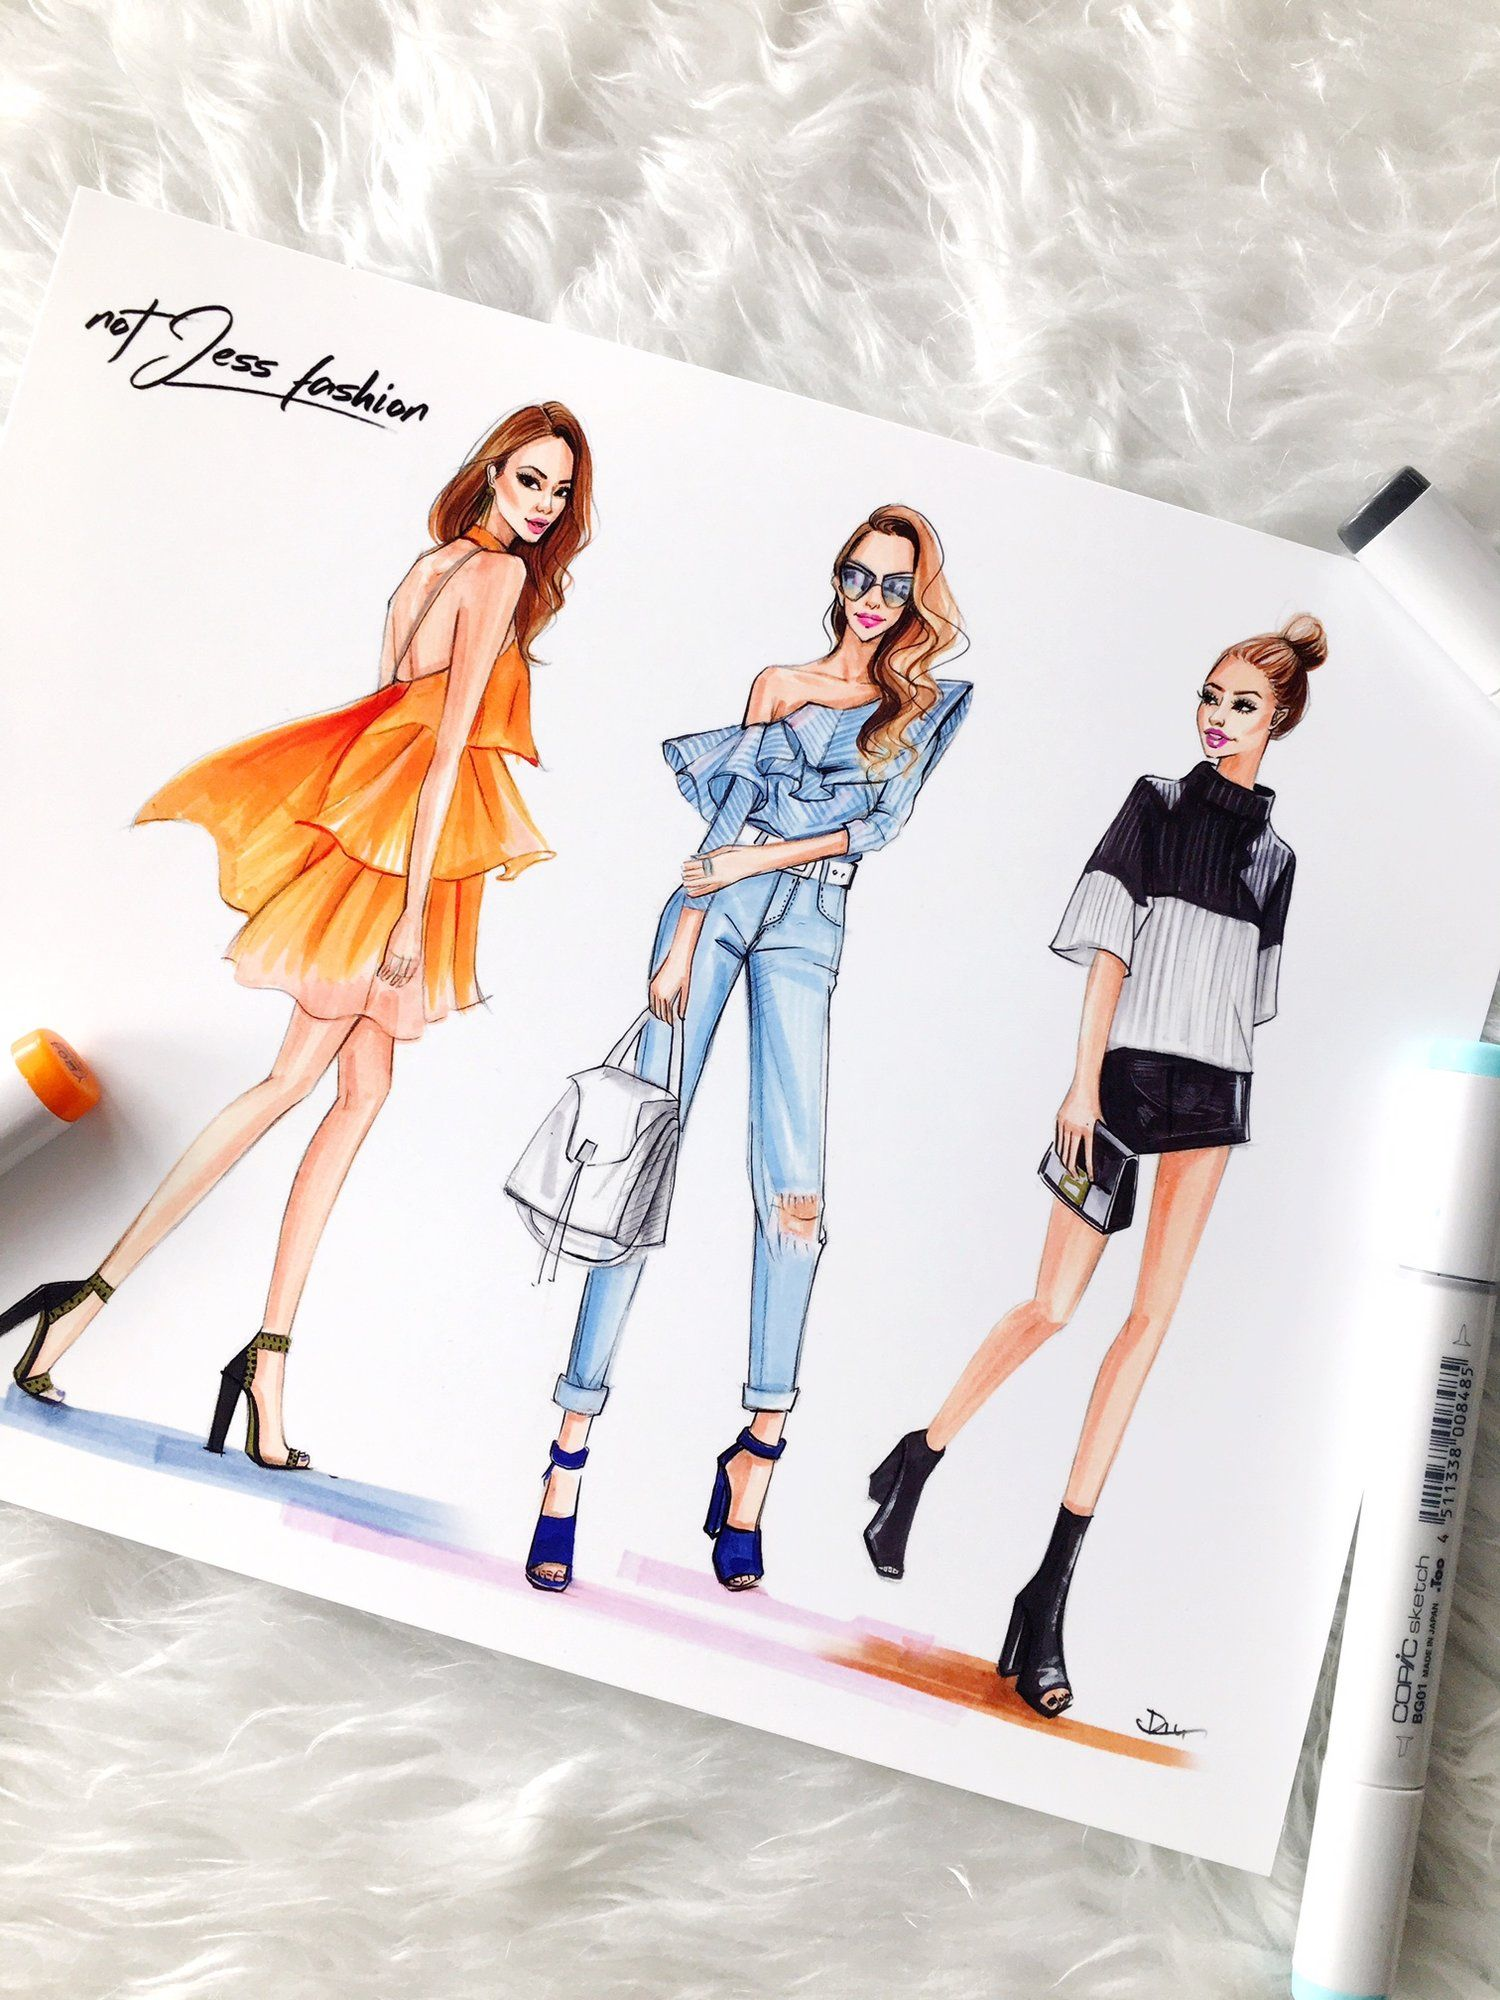 Fashion sketches new fashion sketches - New York Fashion Week Ss17 Recap Sketch